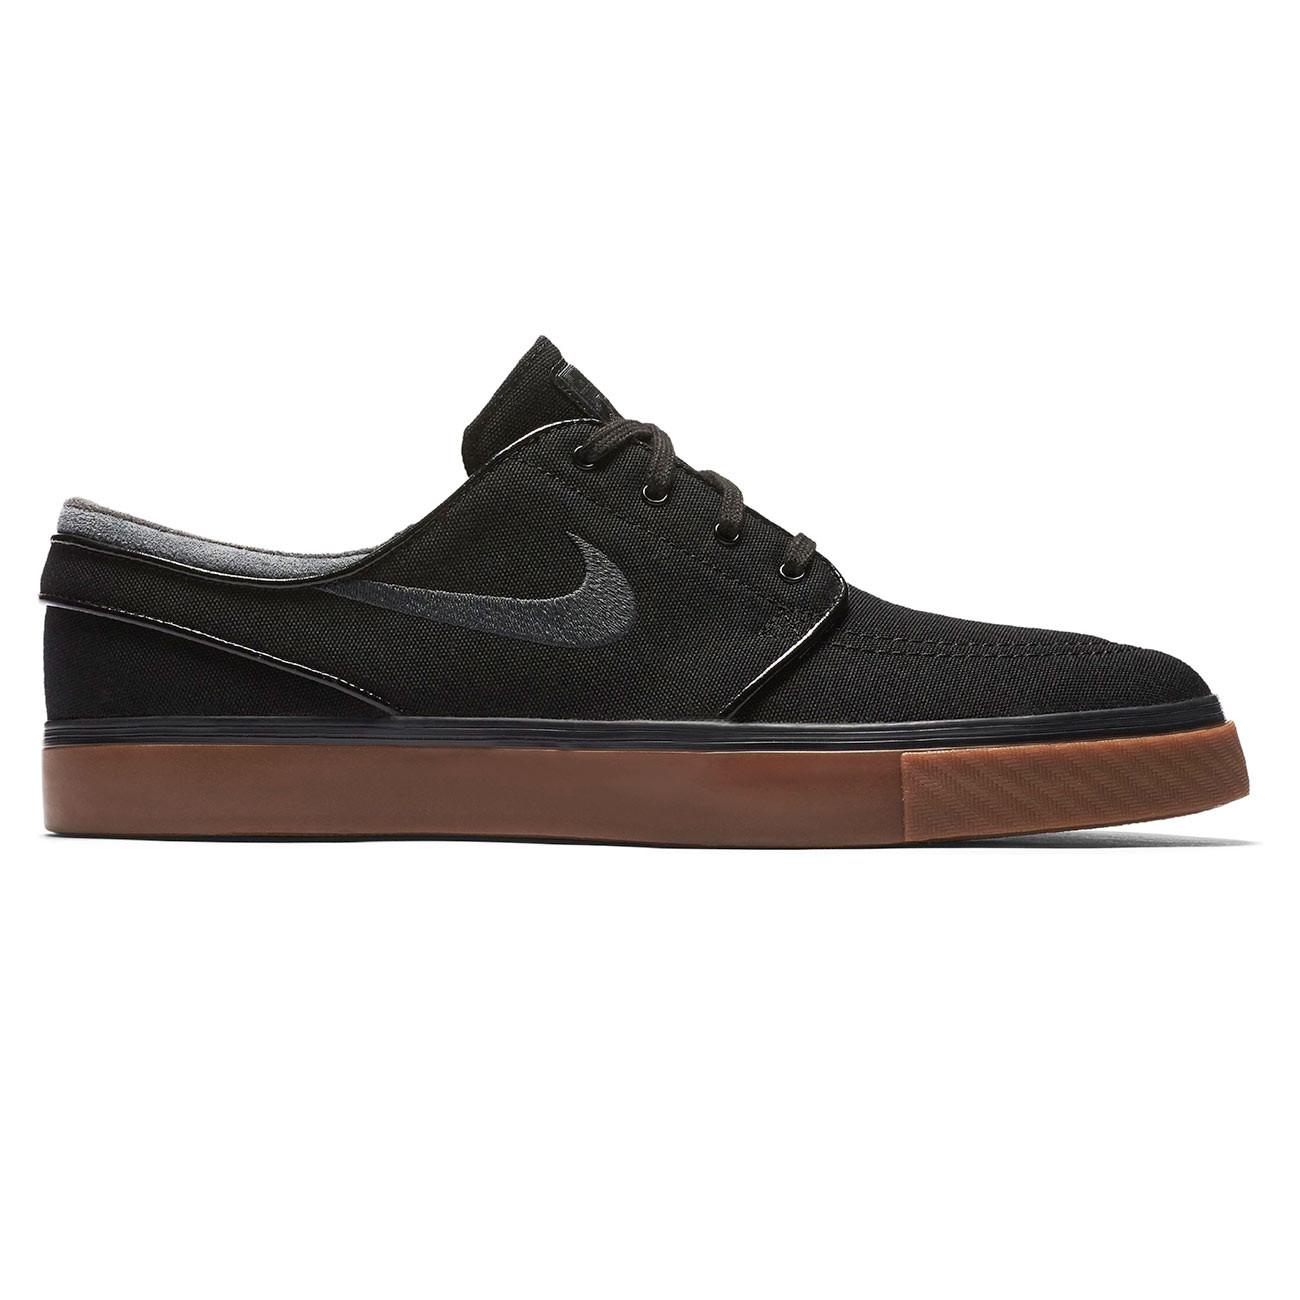 Tenisky Nike SB Zoom Stefan Janoski Canvas black/anthracite-gum med brown